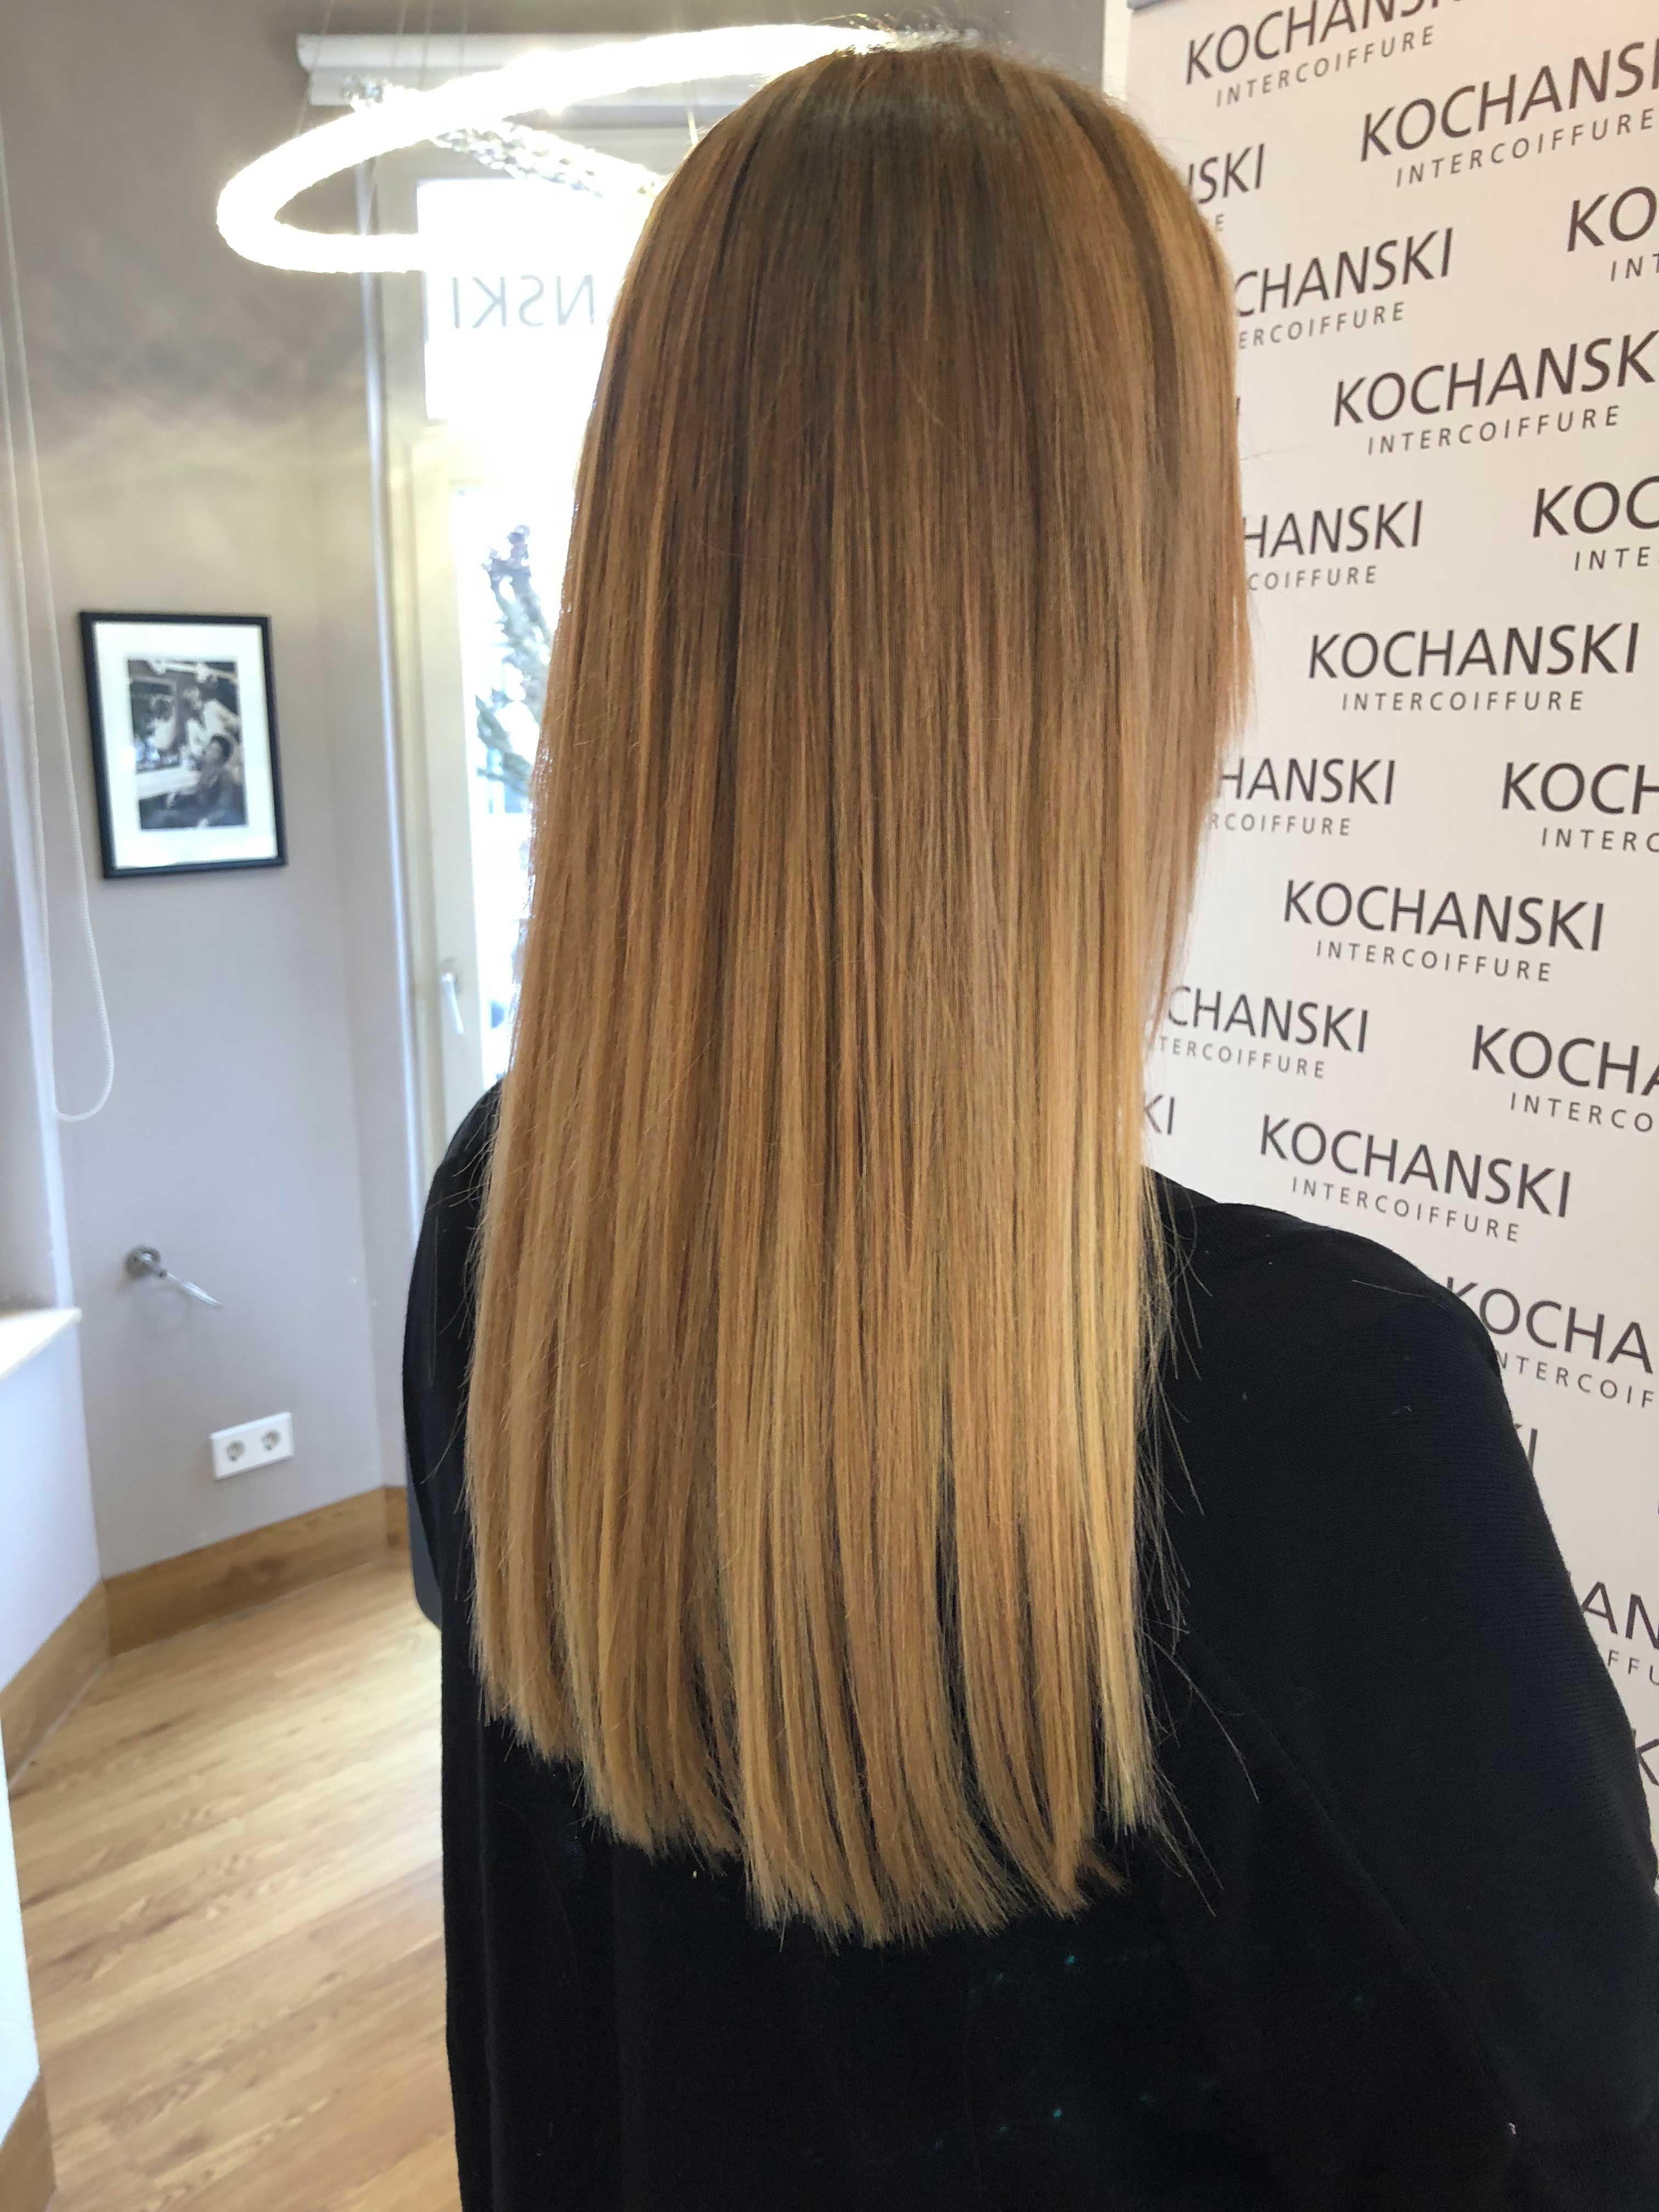 kochanski-haarexperten2